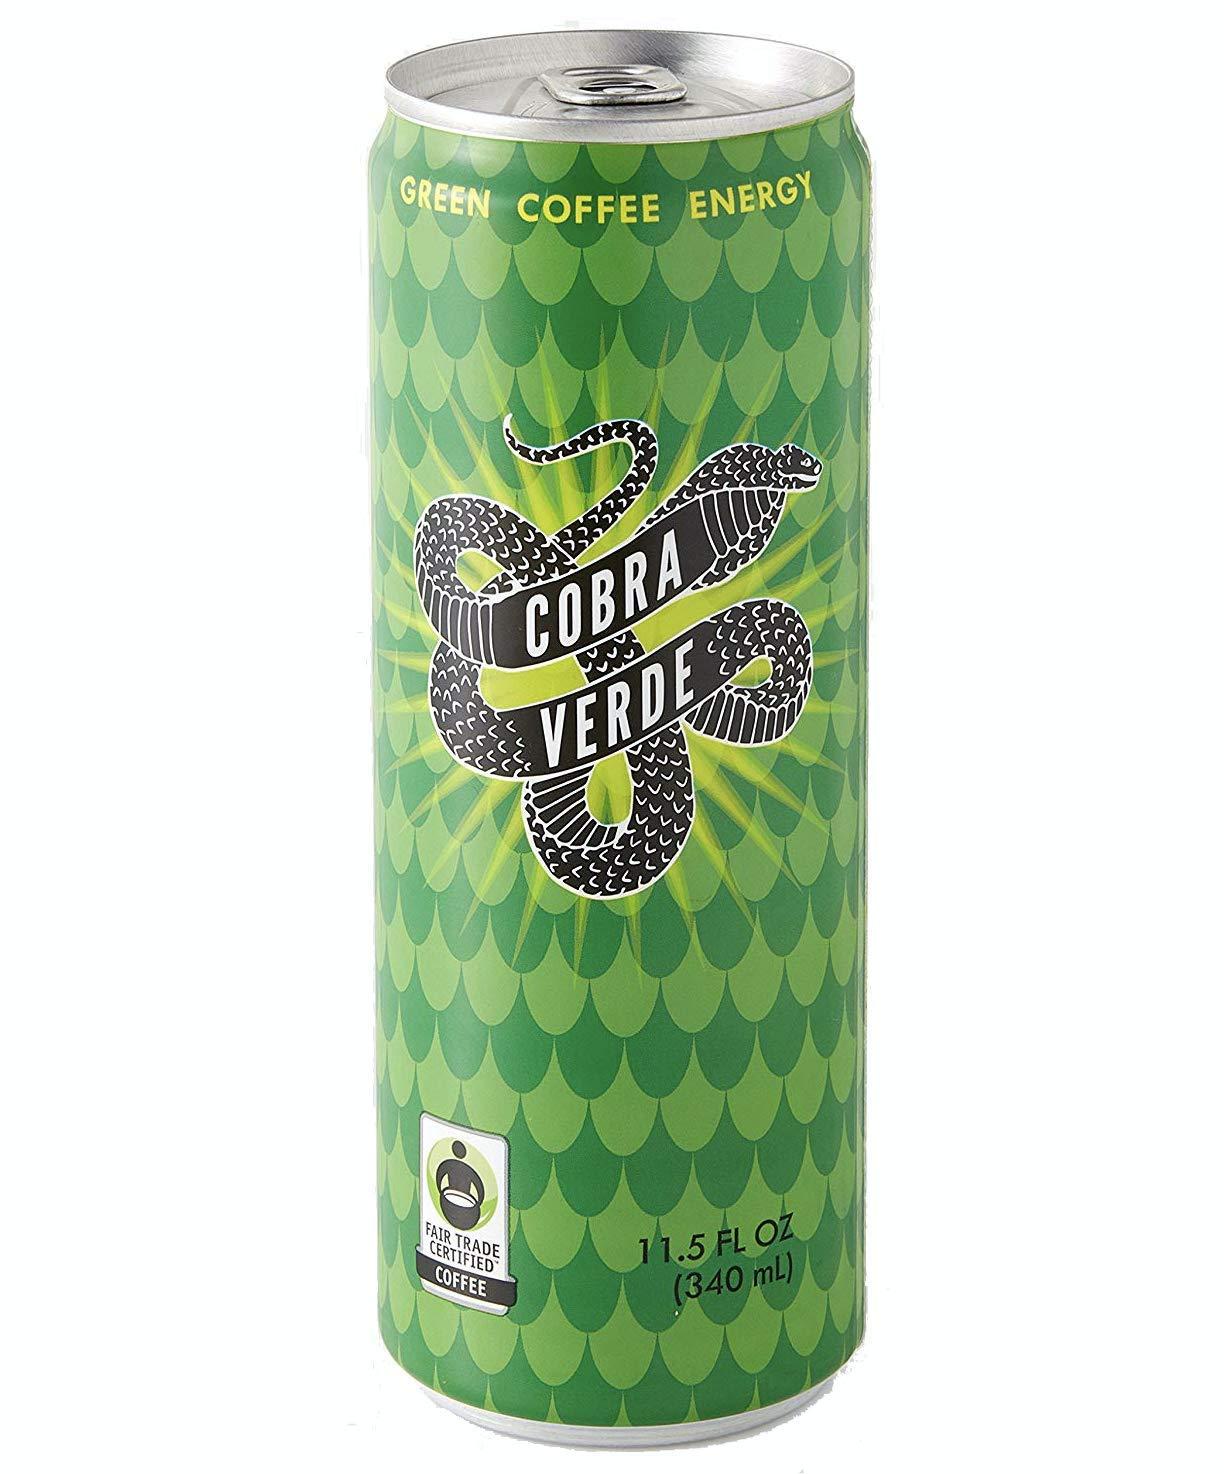 Cobra Verde Green Coffee Citrus Beverage, Fair Trade Certified, - 11.5 Fl Oz   Pack of 24